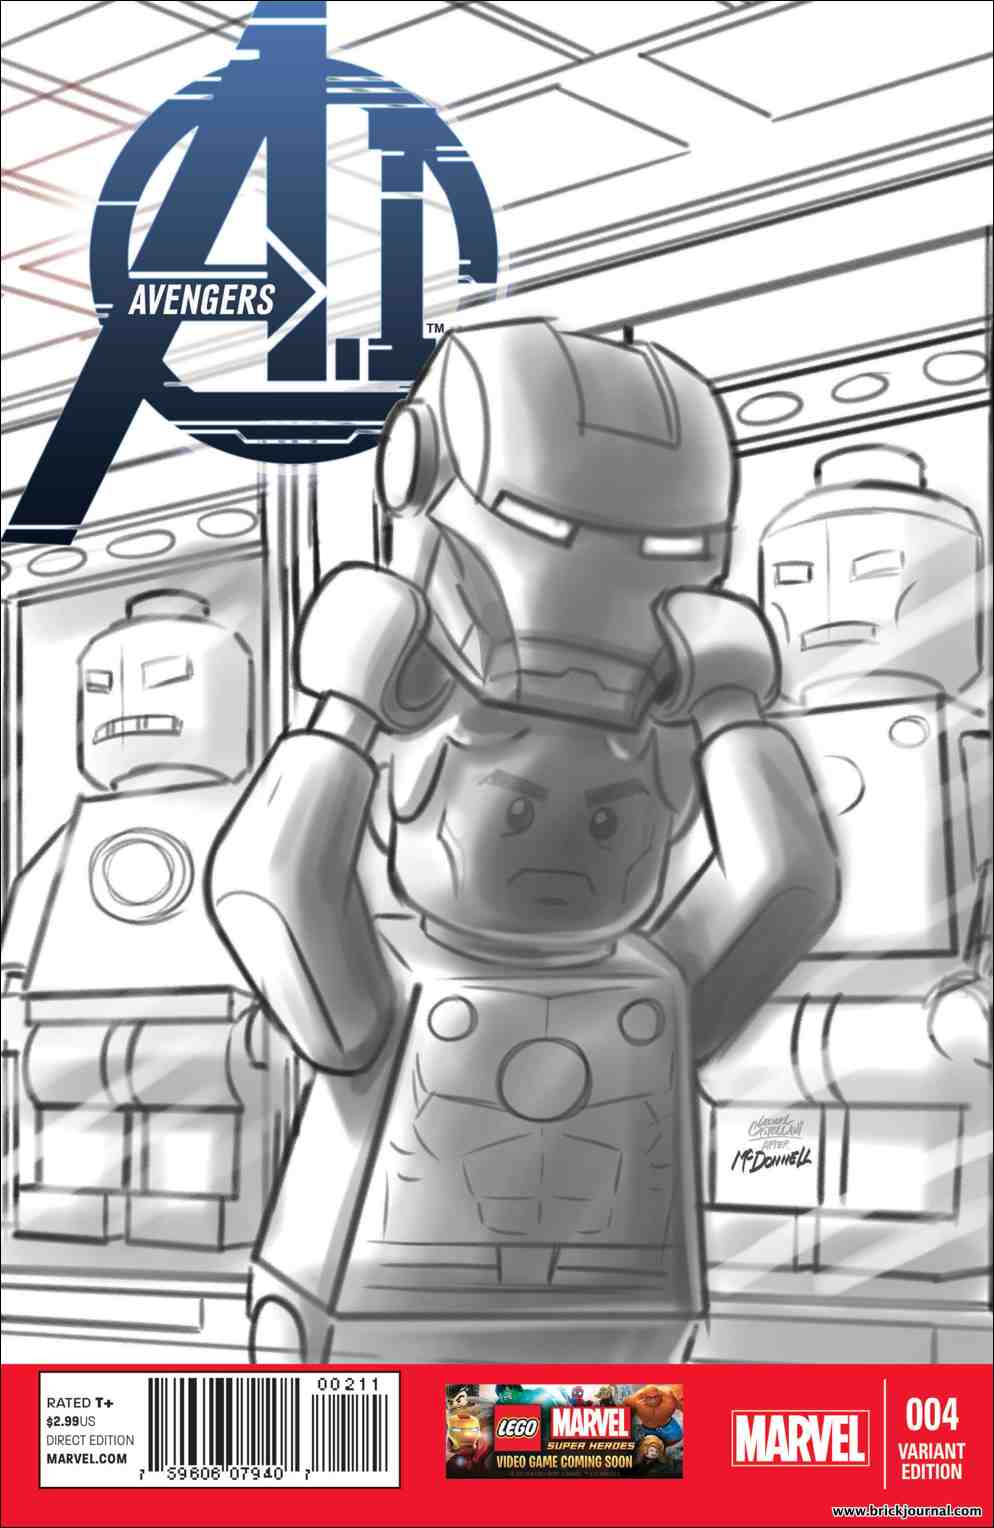 Avengers Iron Man sketch